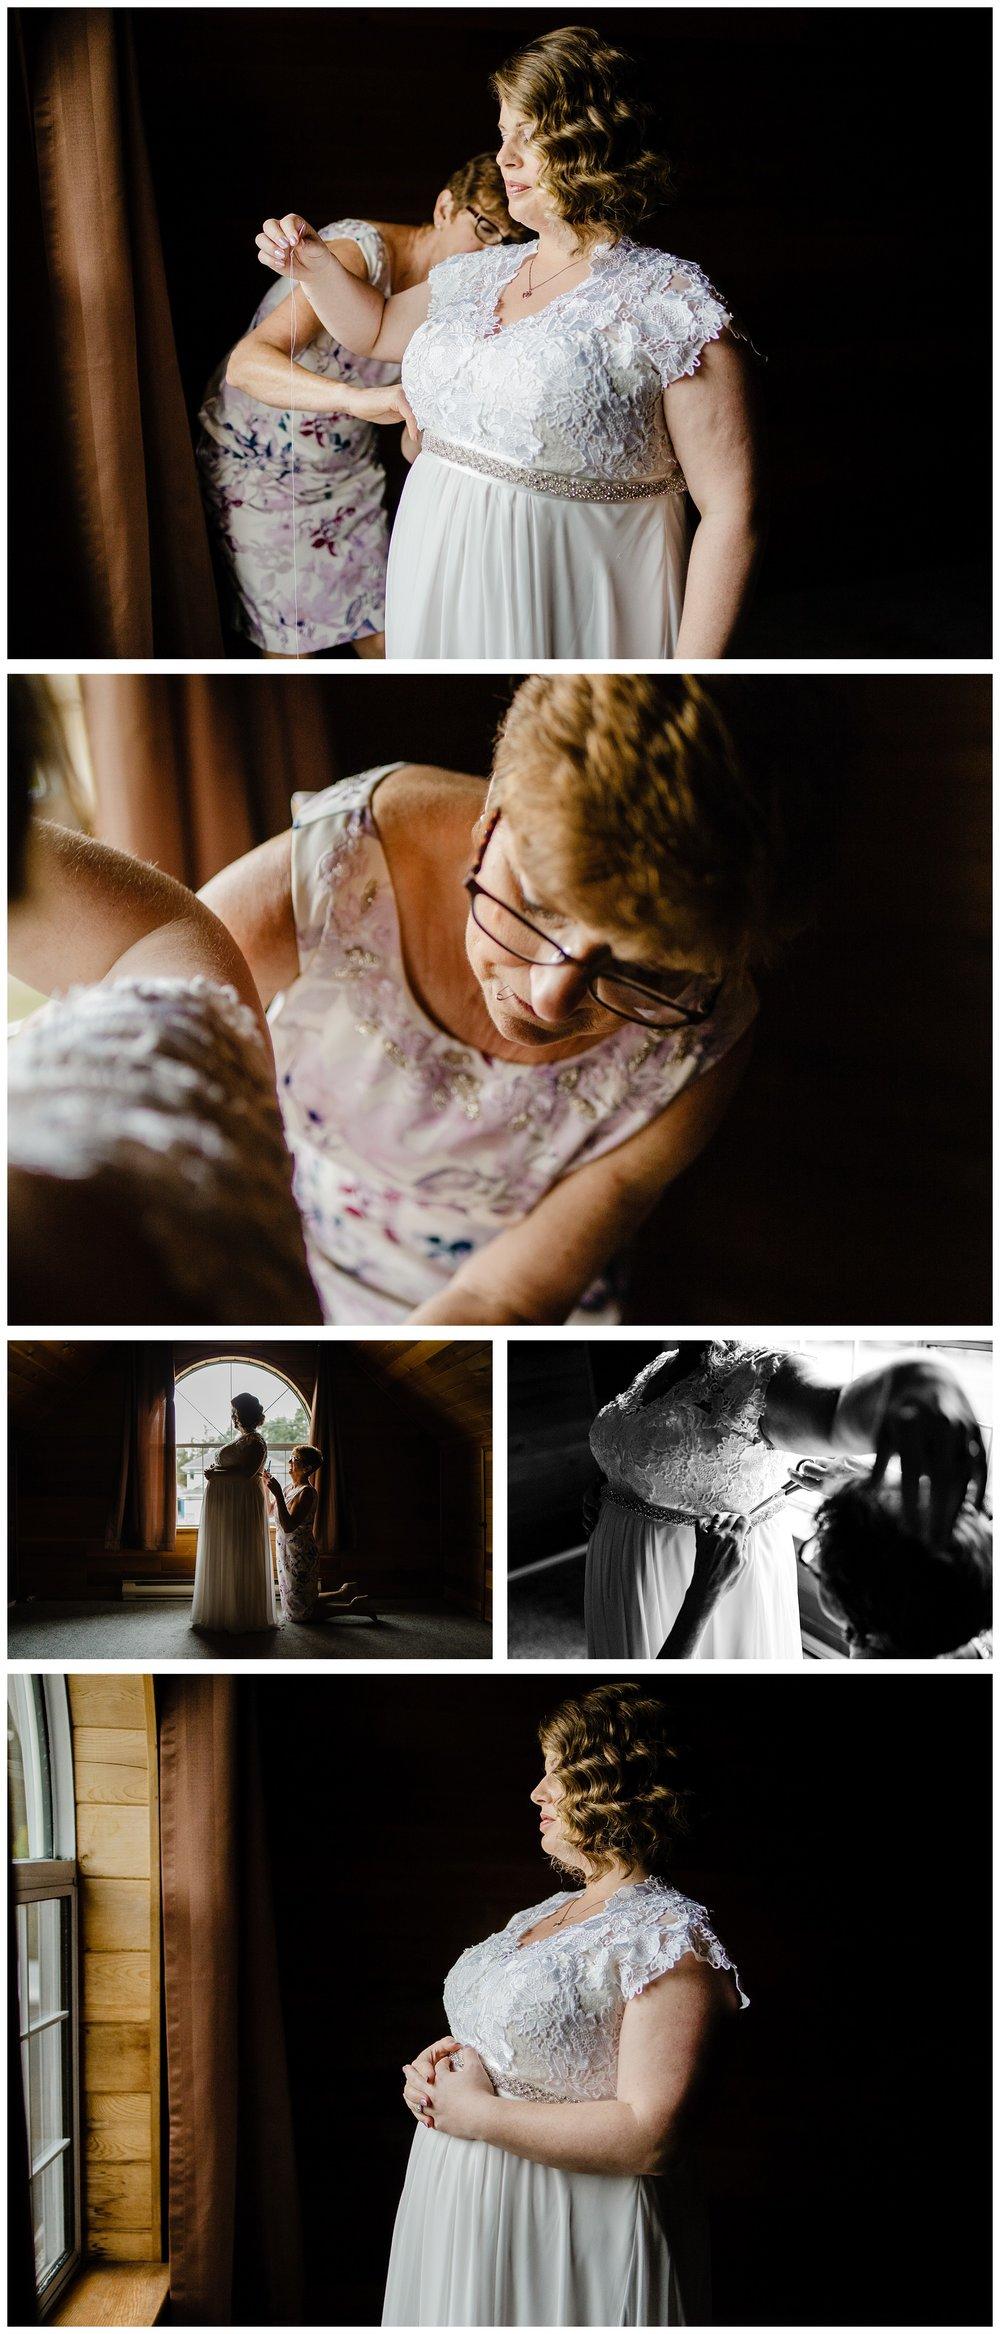 Aldergrove Park Fall Backyard Wedding Photographer Pregnant Bride Tent Outdoor BC Canada Best Wedding Photographer_0009.jpg